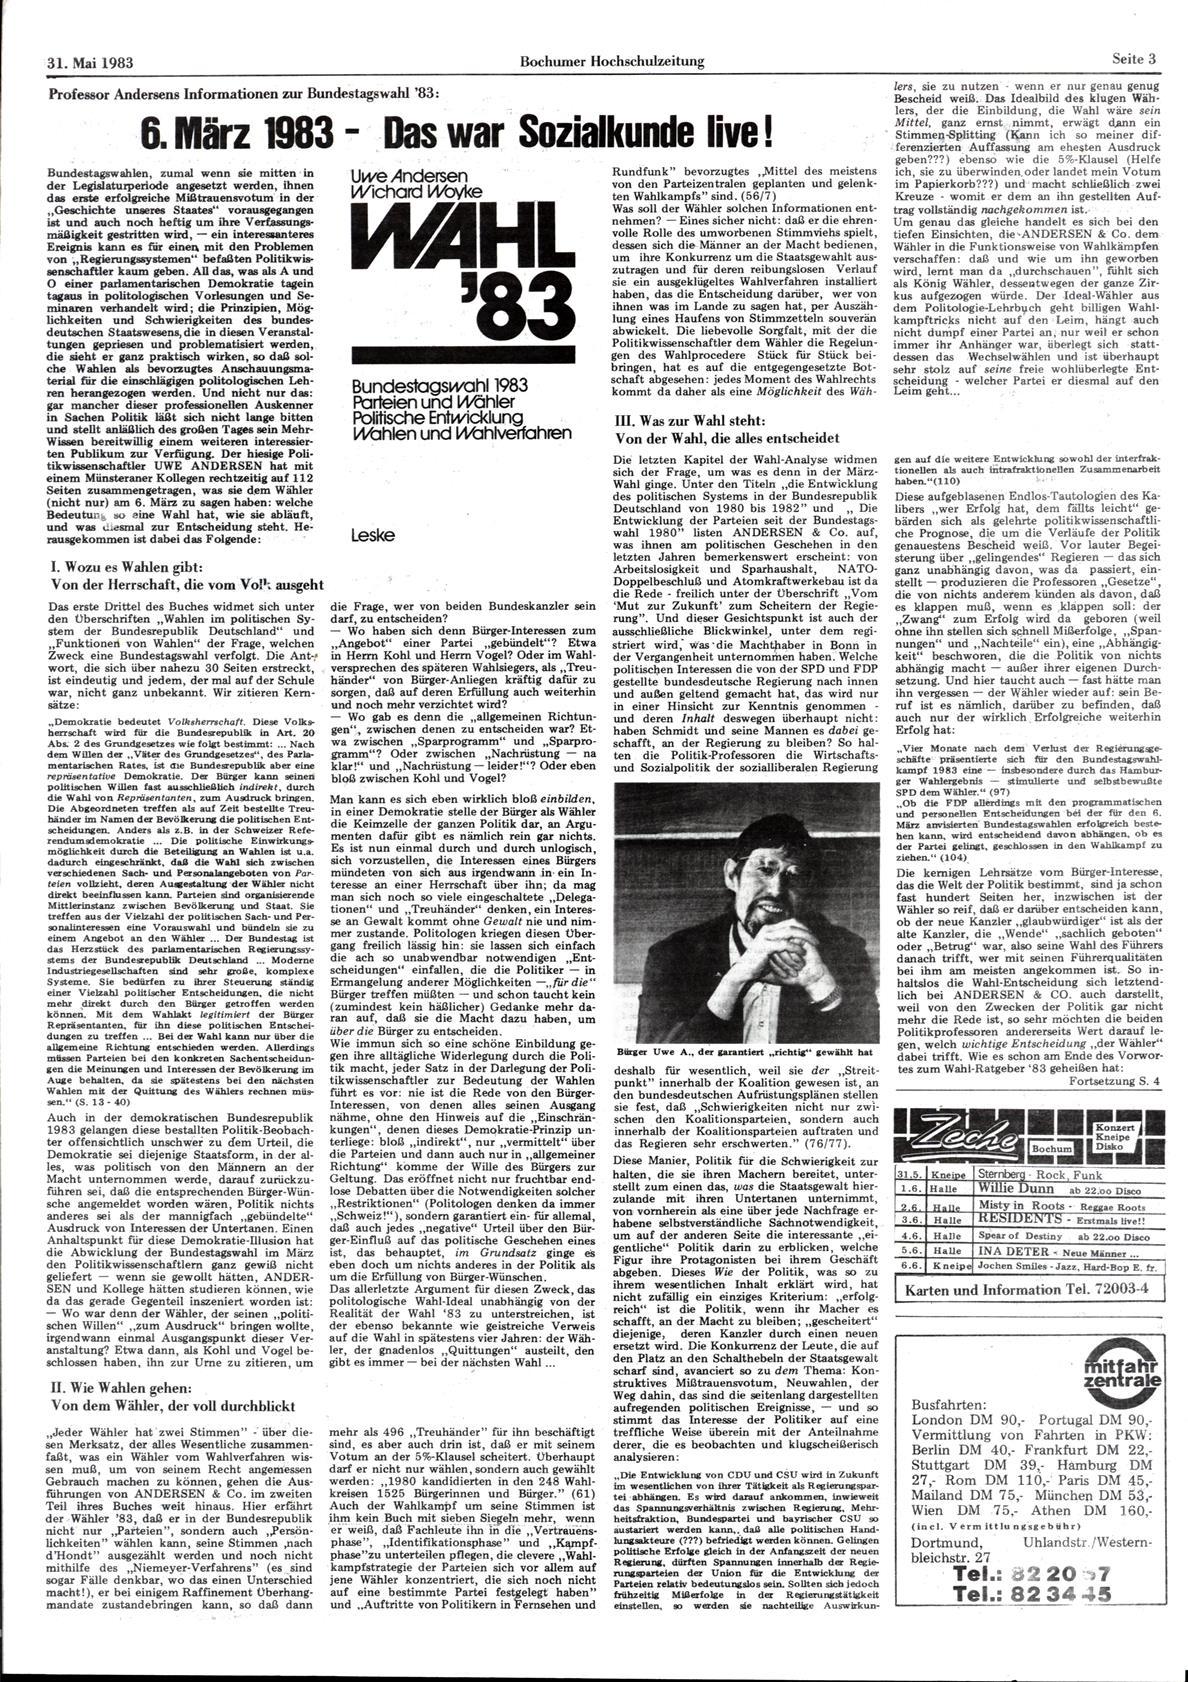 Bochum_BHZ_19830531_070_003